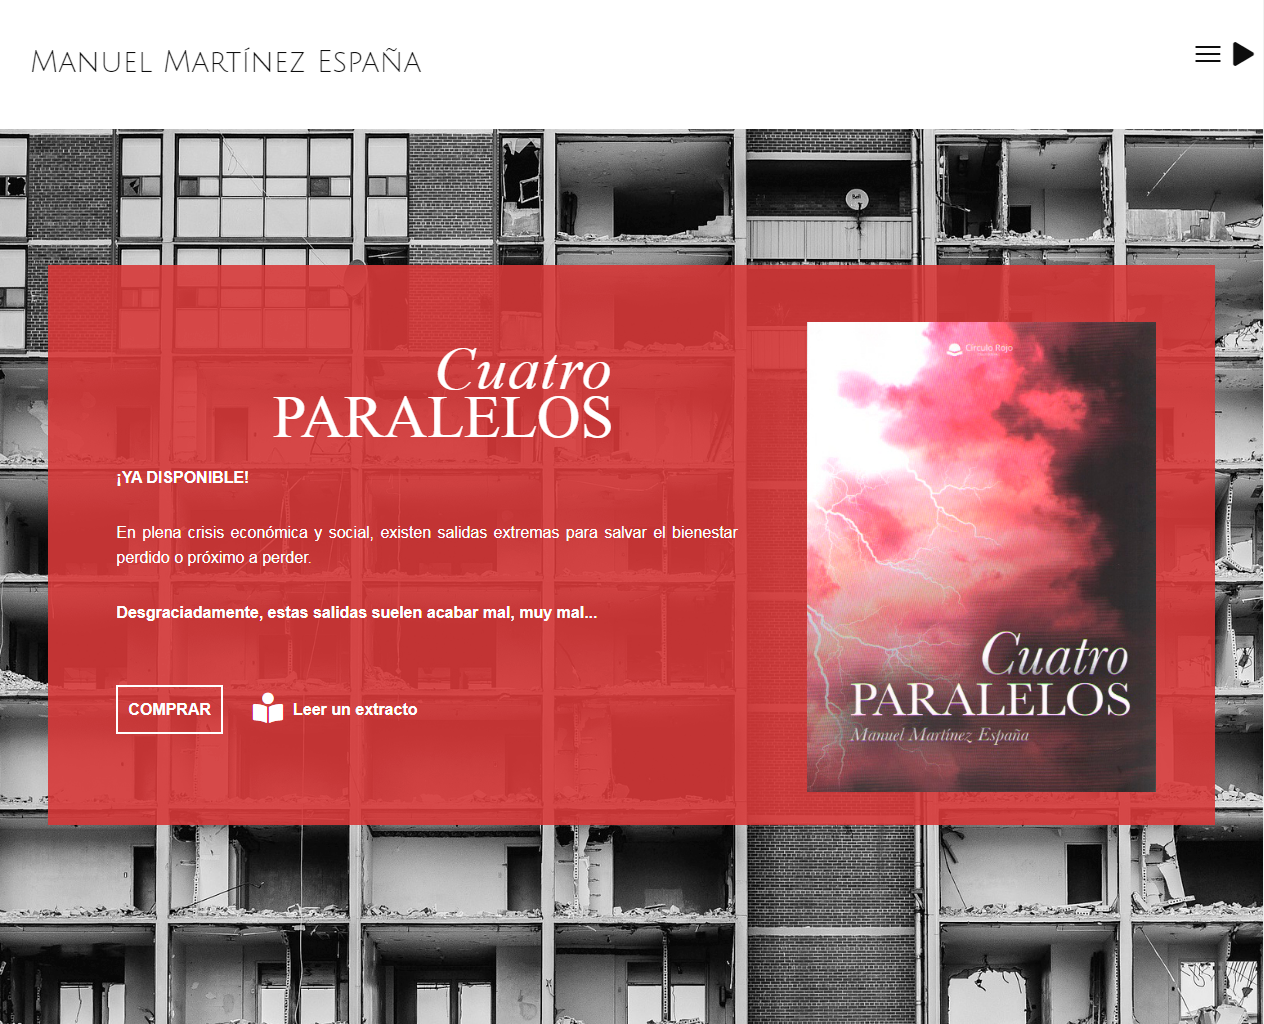 webmanuelmartinezespana